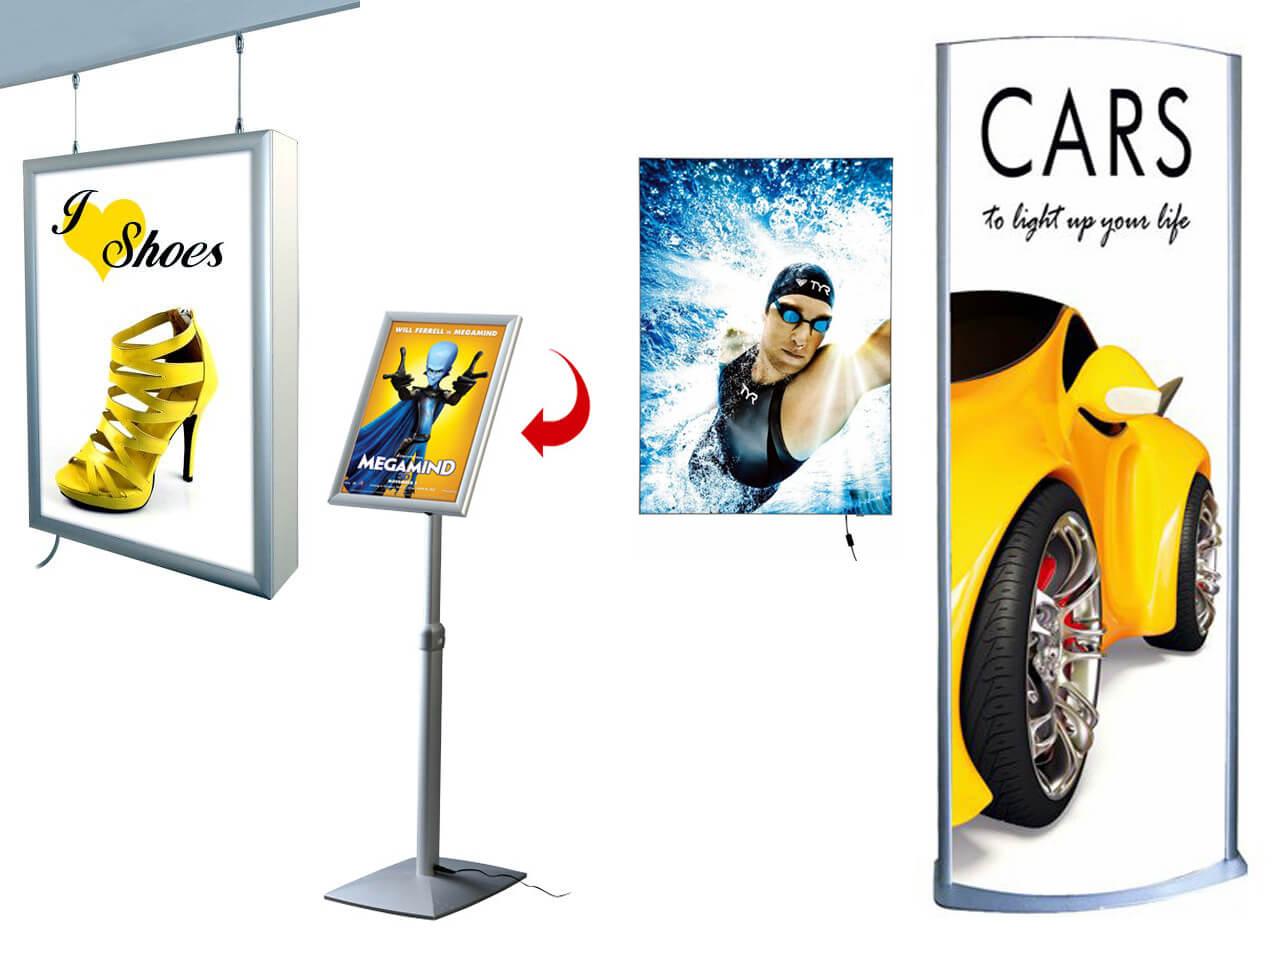 Bilderrahmen-LEDFlaechen-Licht-Leuchtsaeule-Infostaender-Display